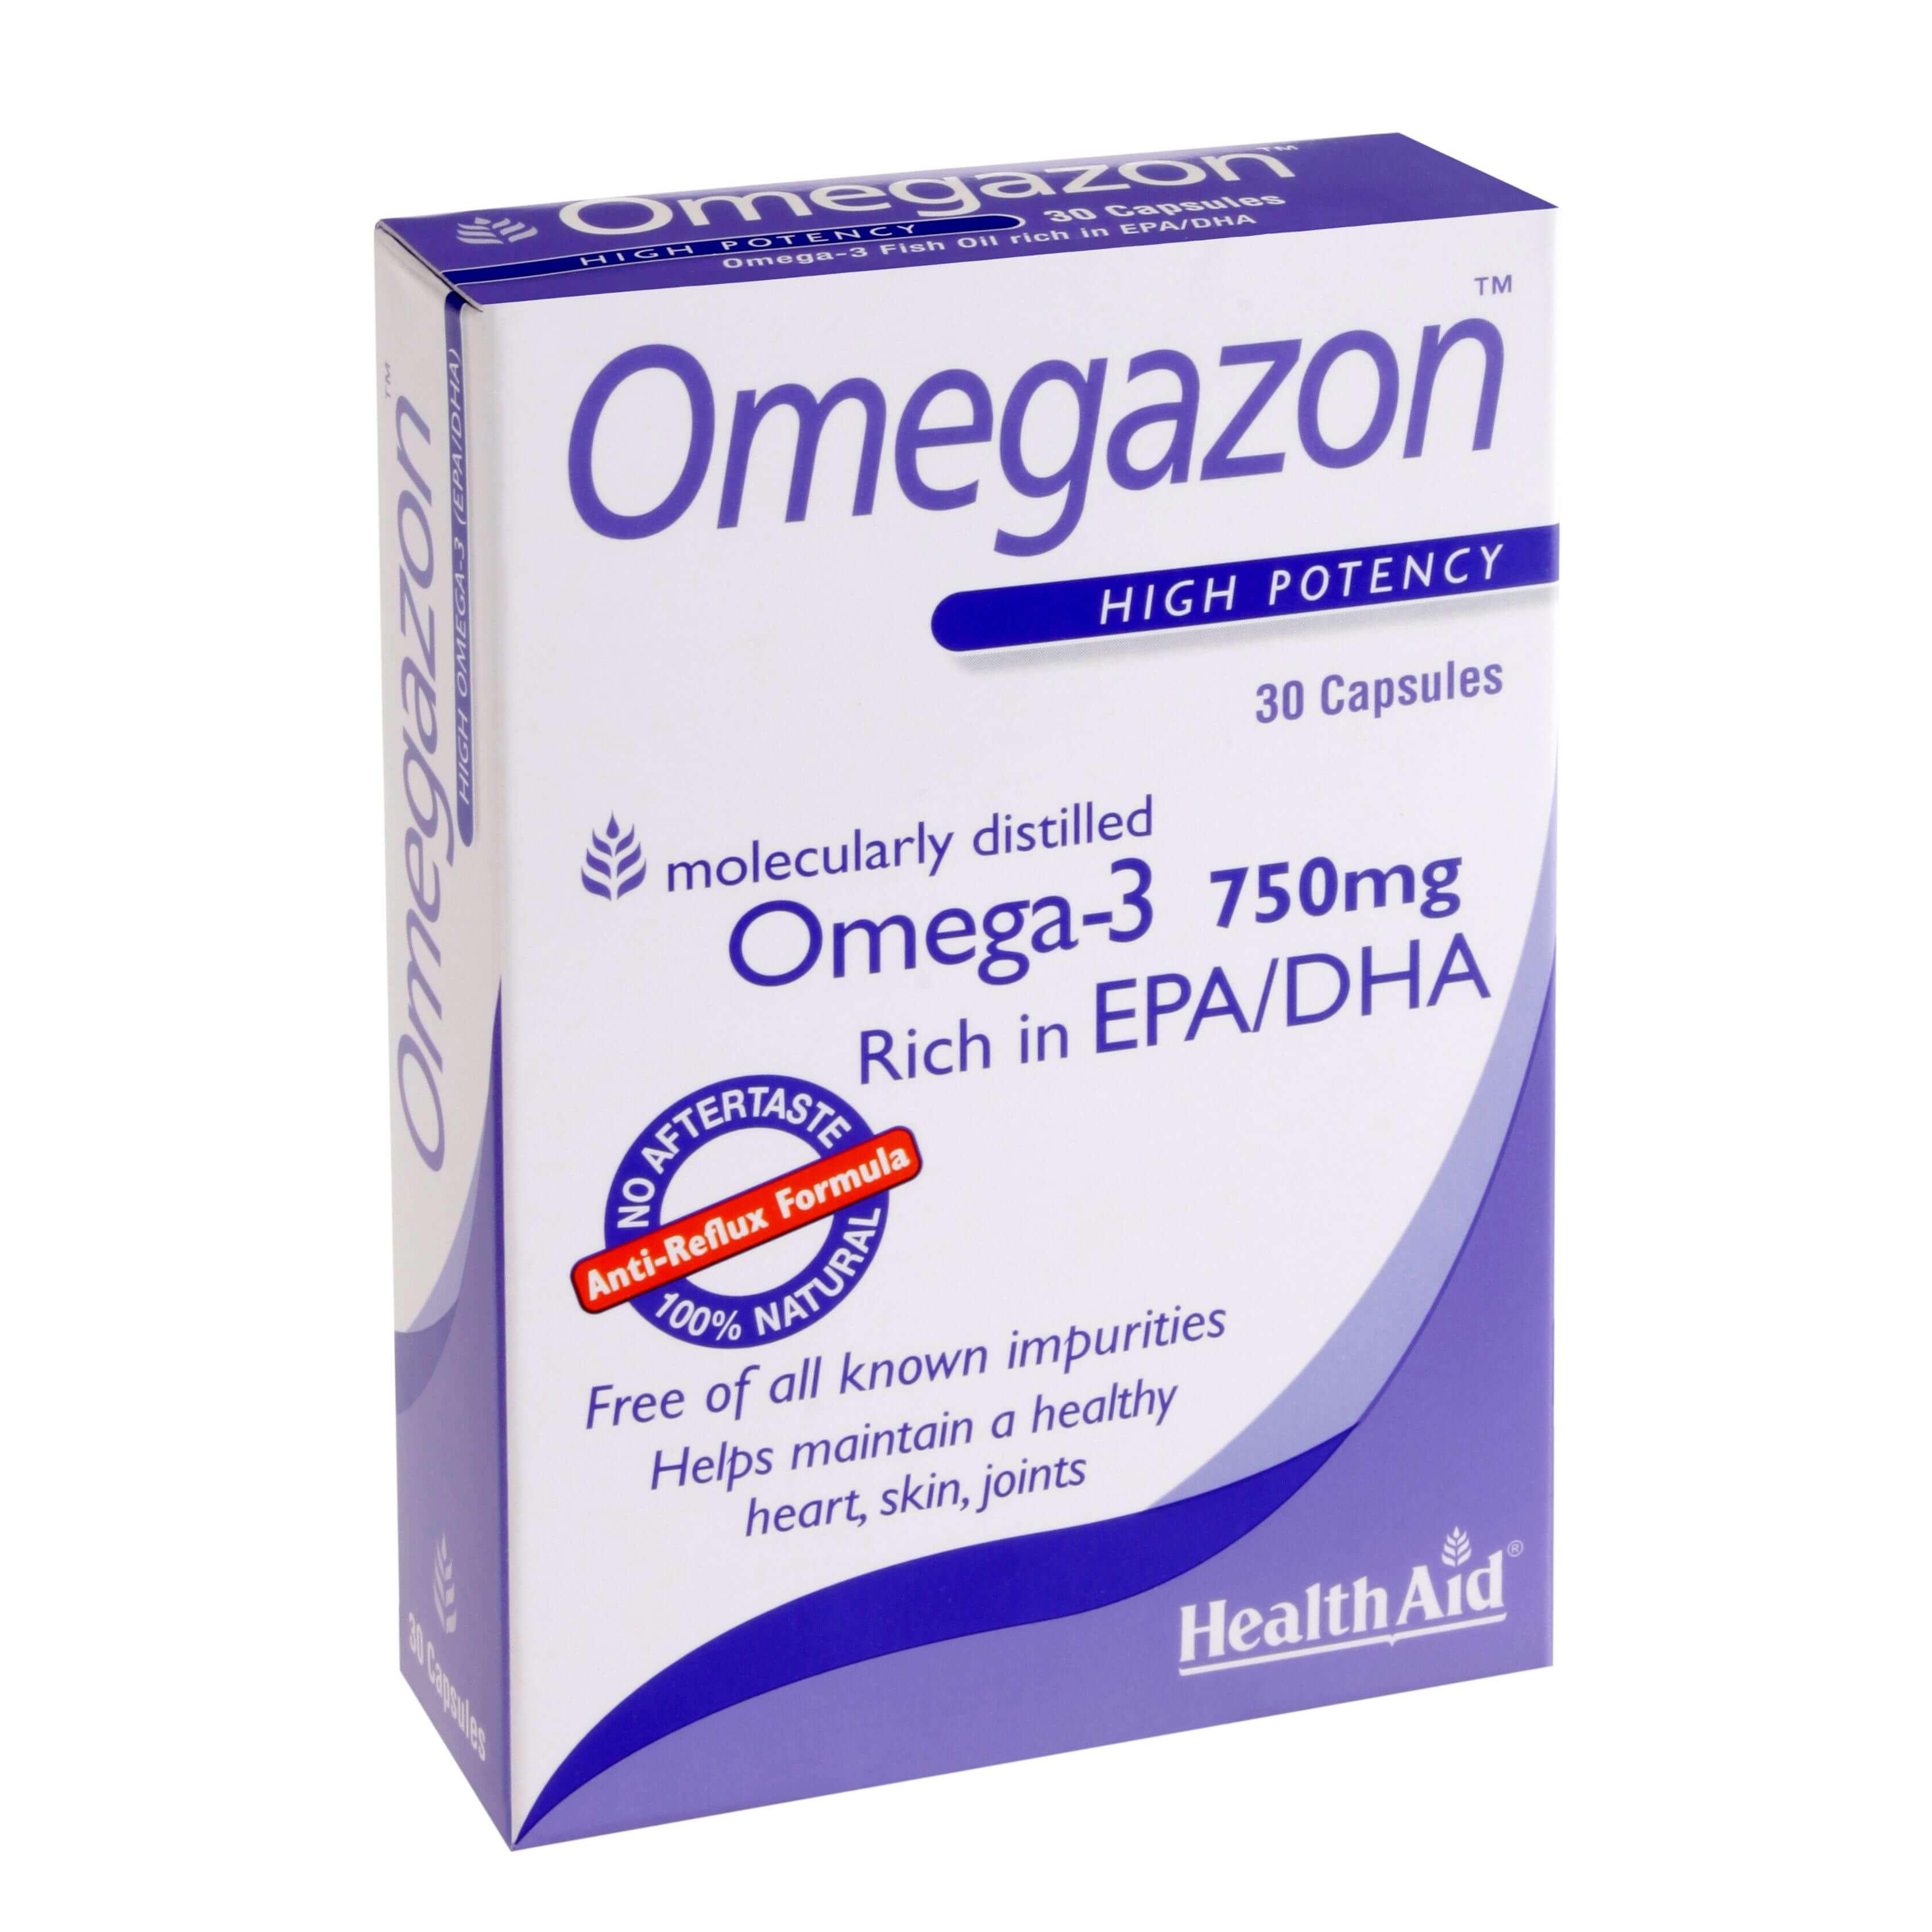 Health Aid Omegazon -Blister 750Mg Νορβηγικά Ιχθυέλαια Διπλής Μοριακής Απόσταξης 30Caps